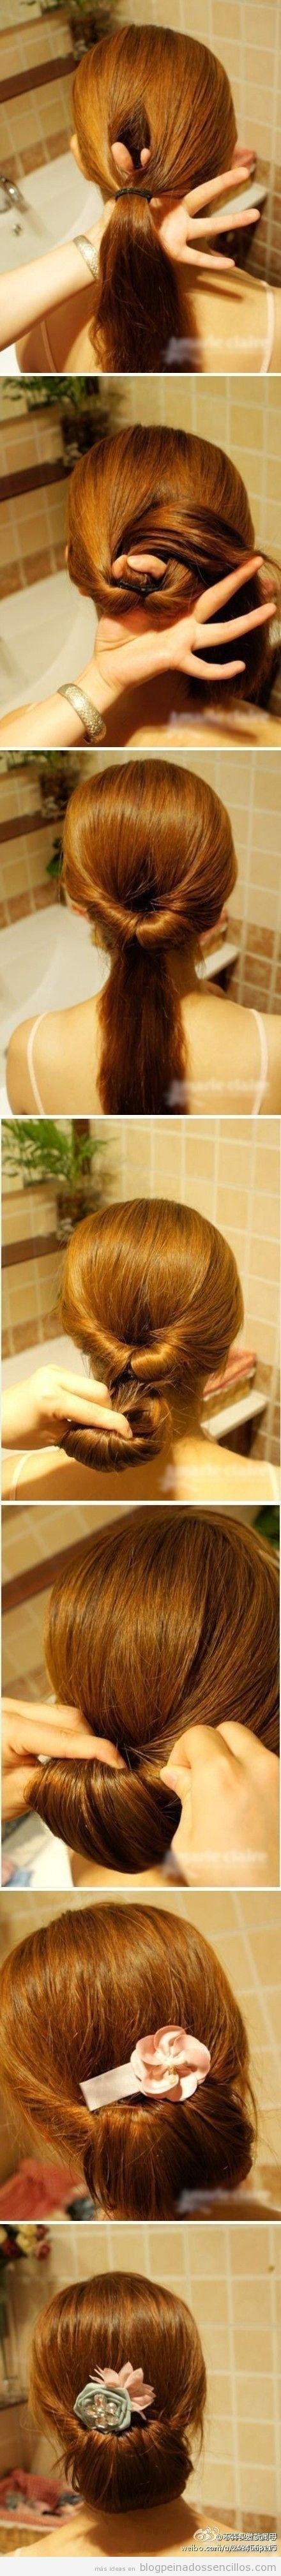 Festopsætning skulderlangt hår.